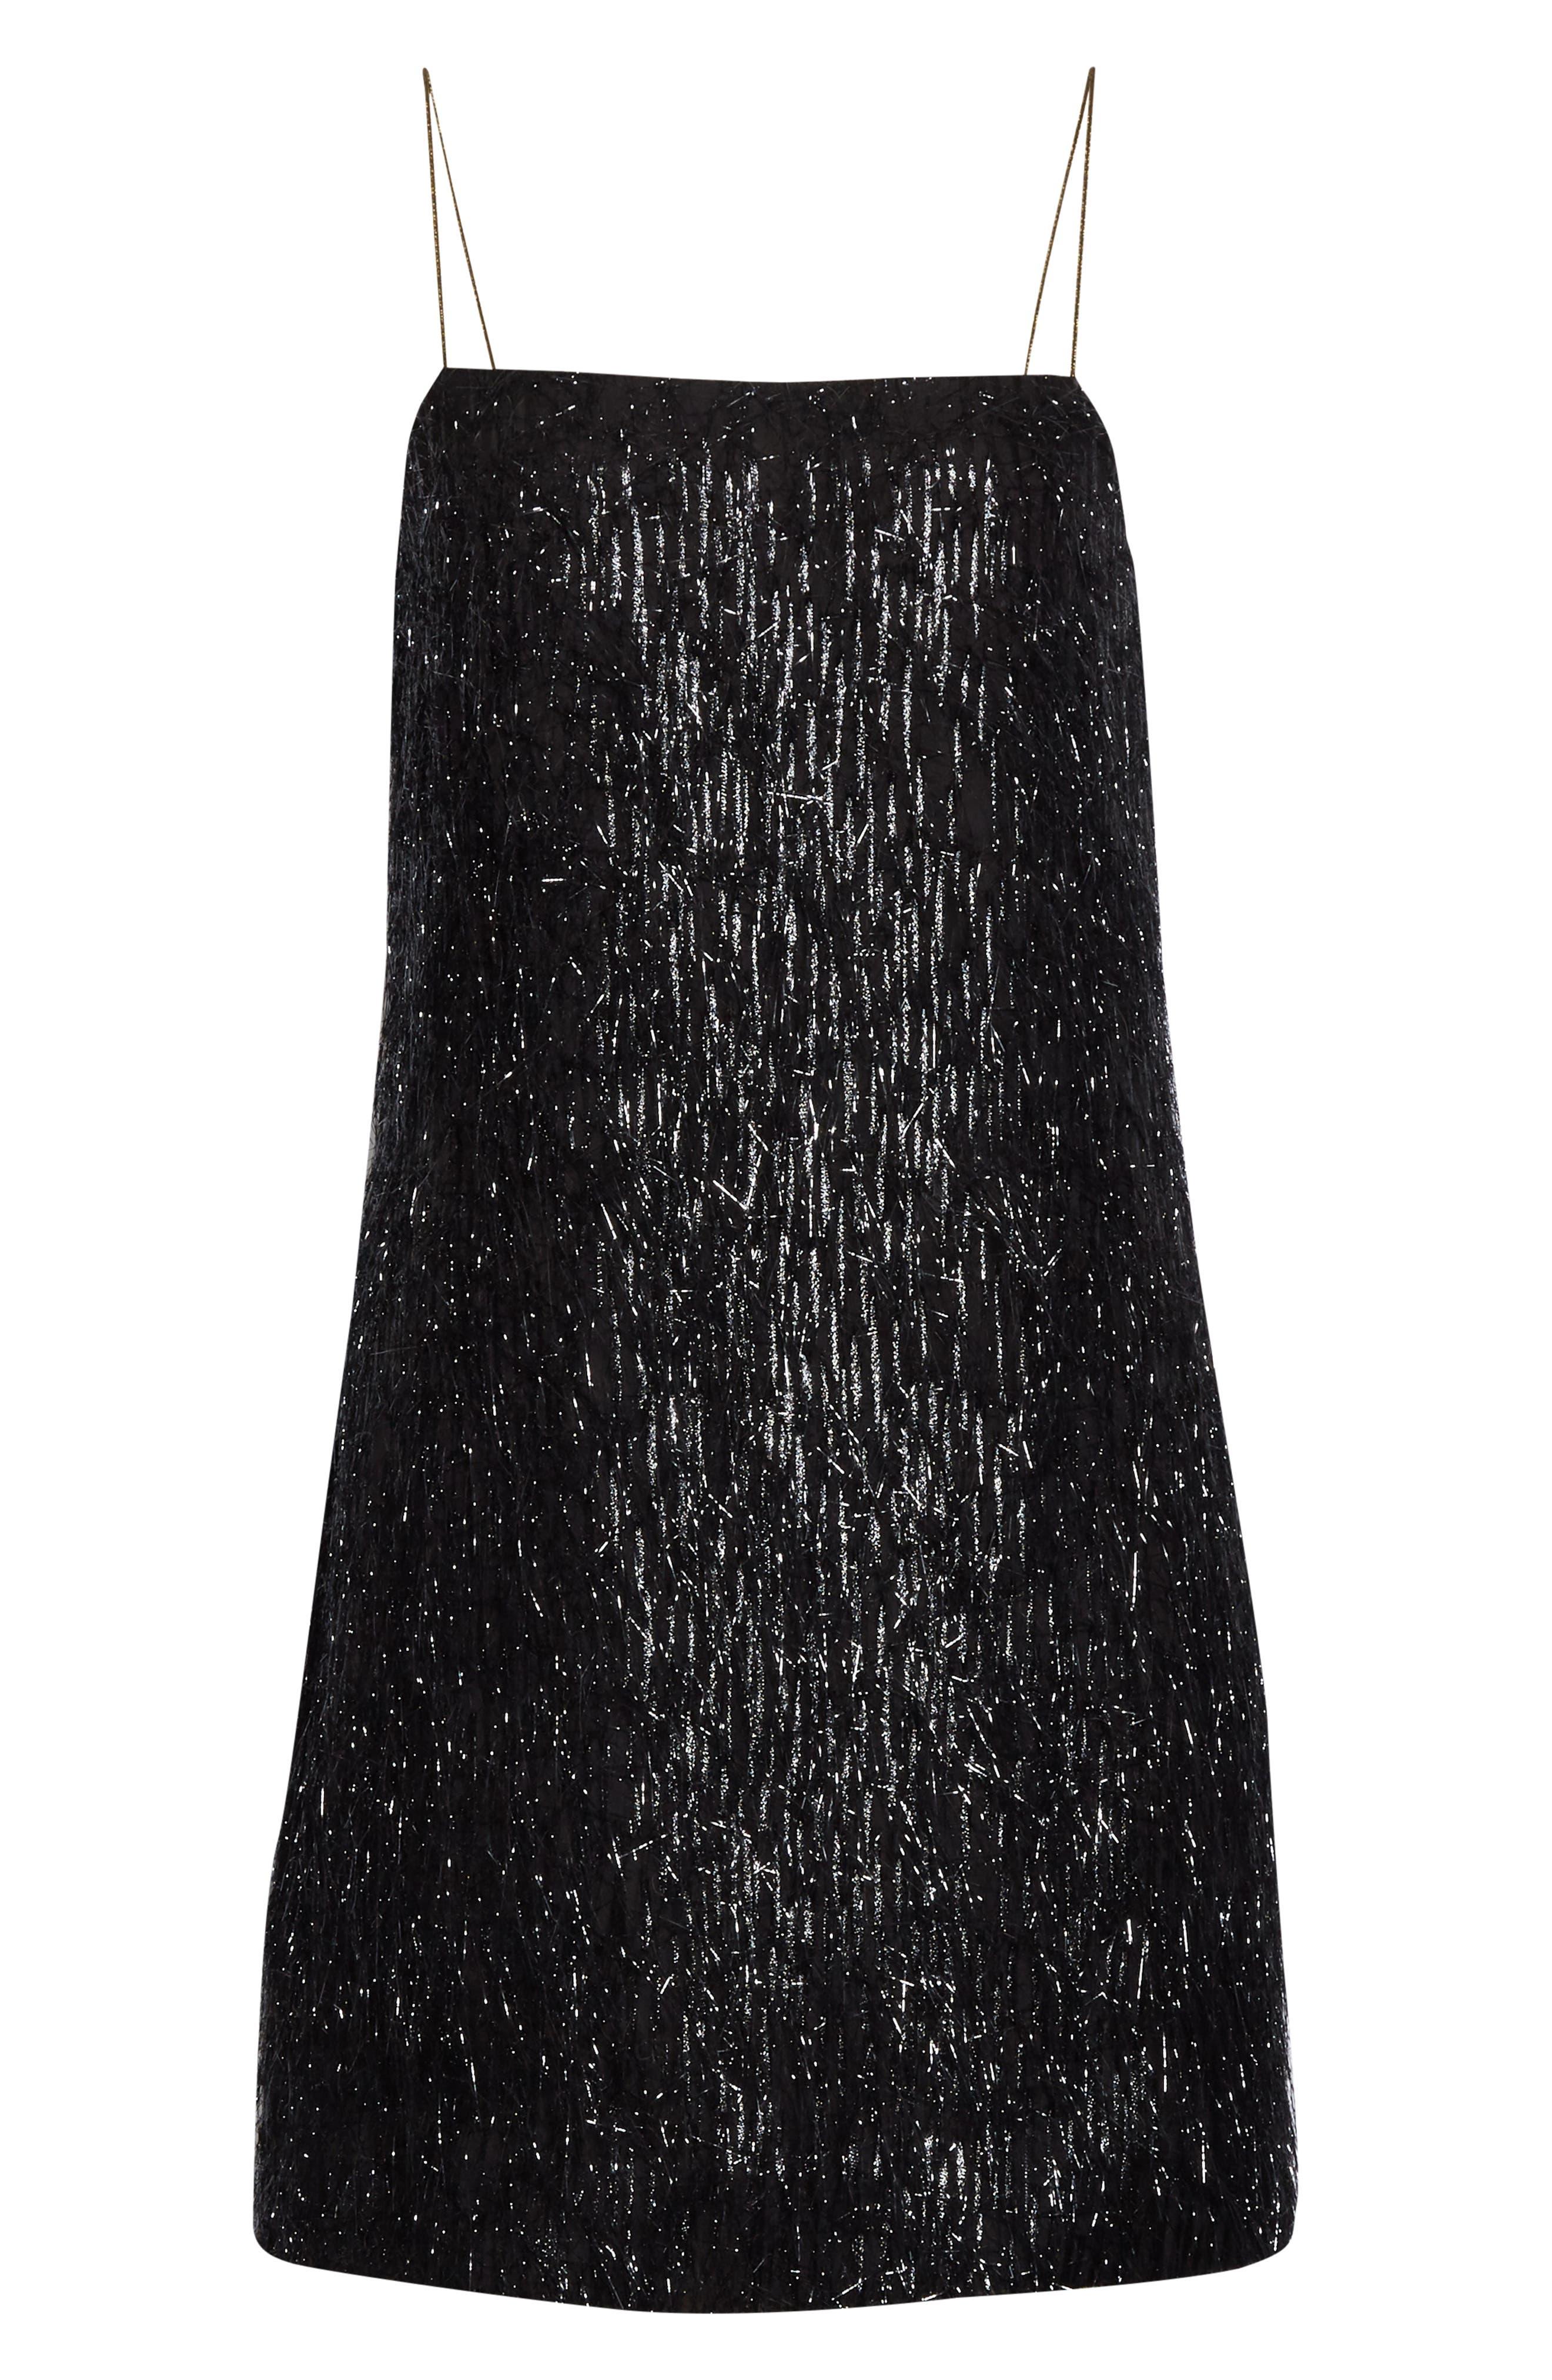 Kate spade new york LUREX FRINGE MINI DRESS